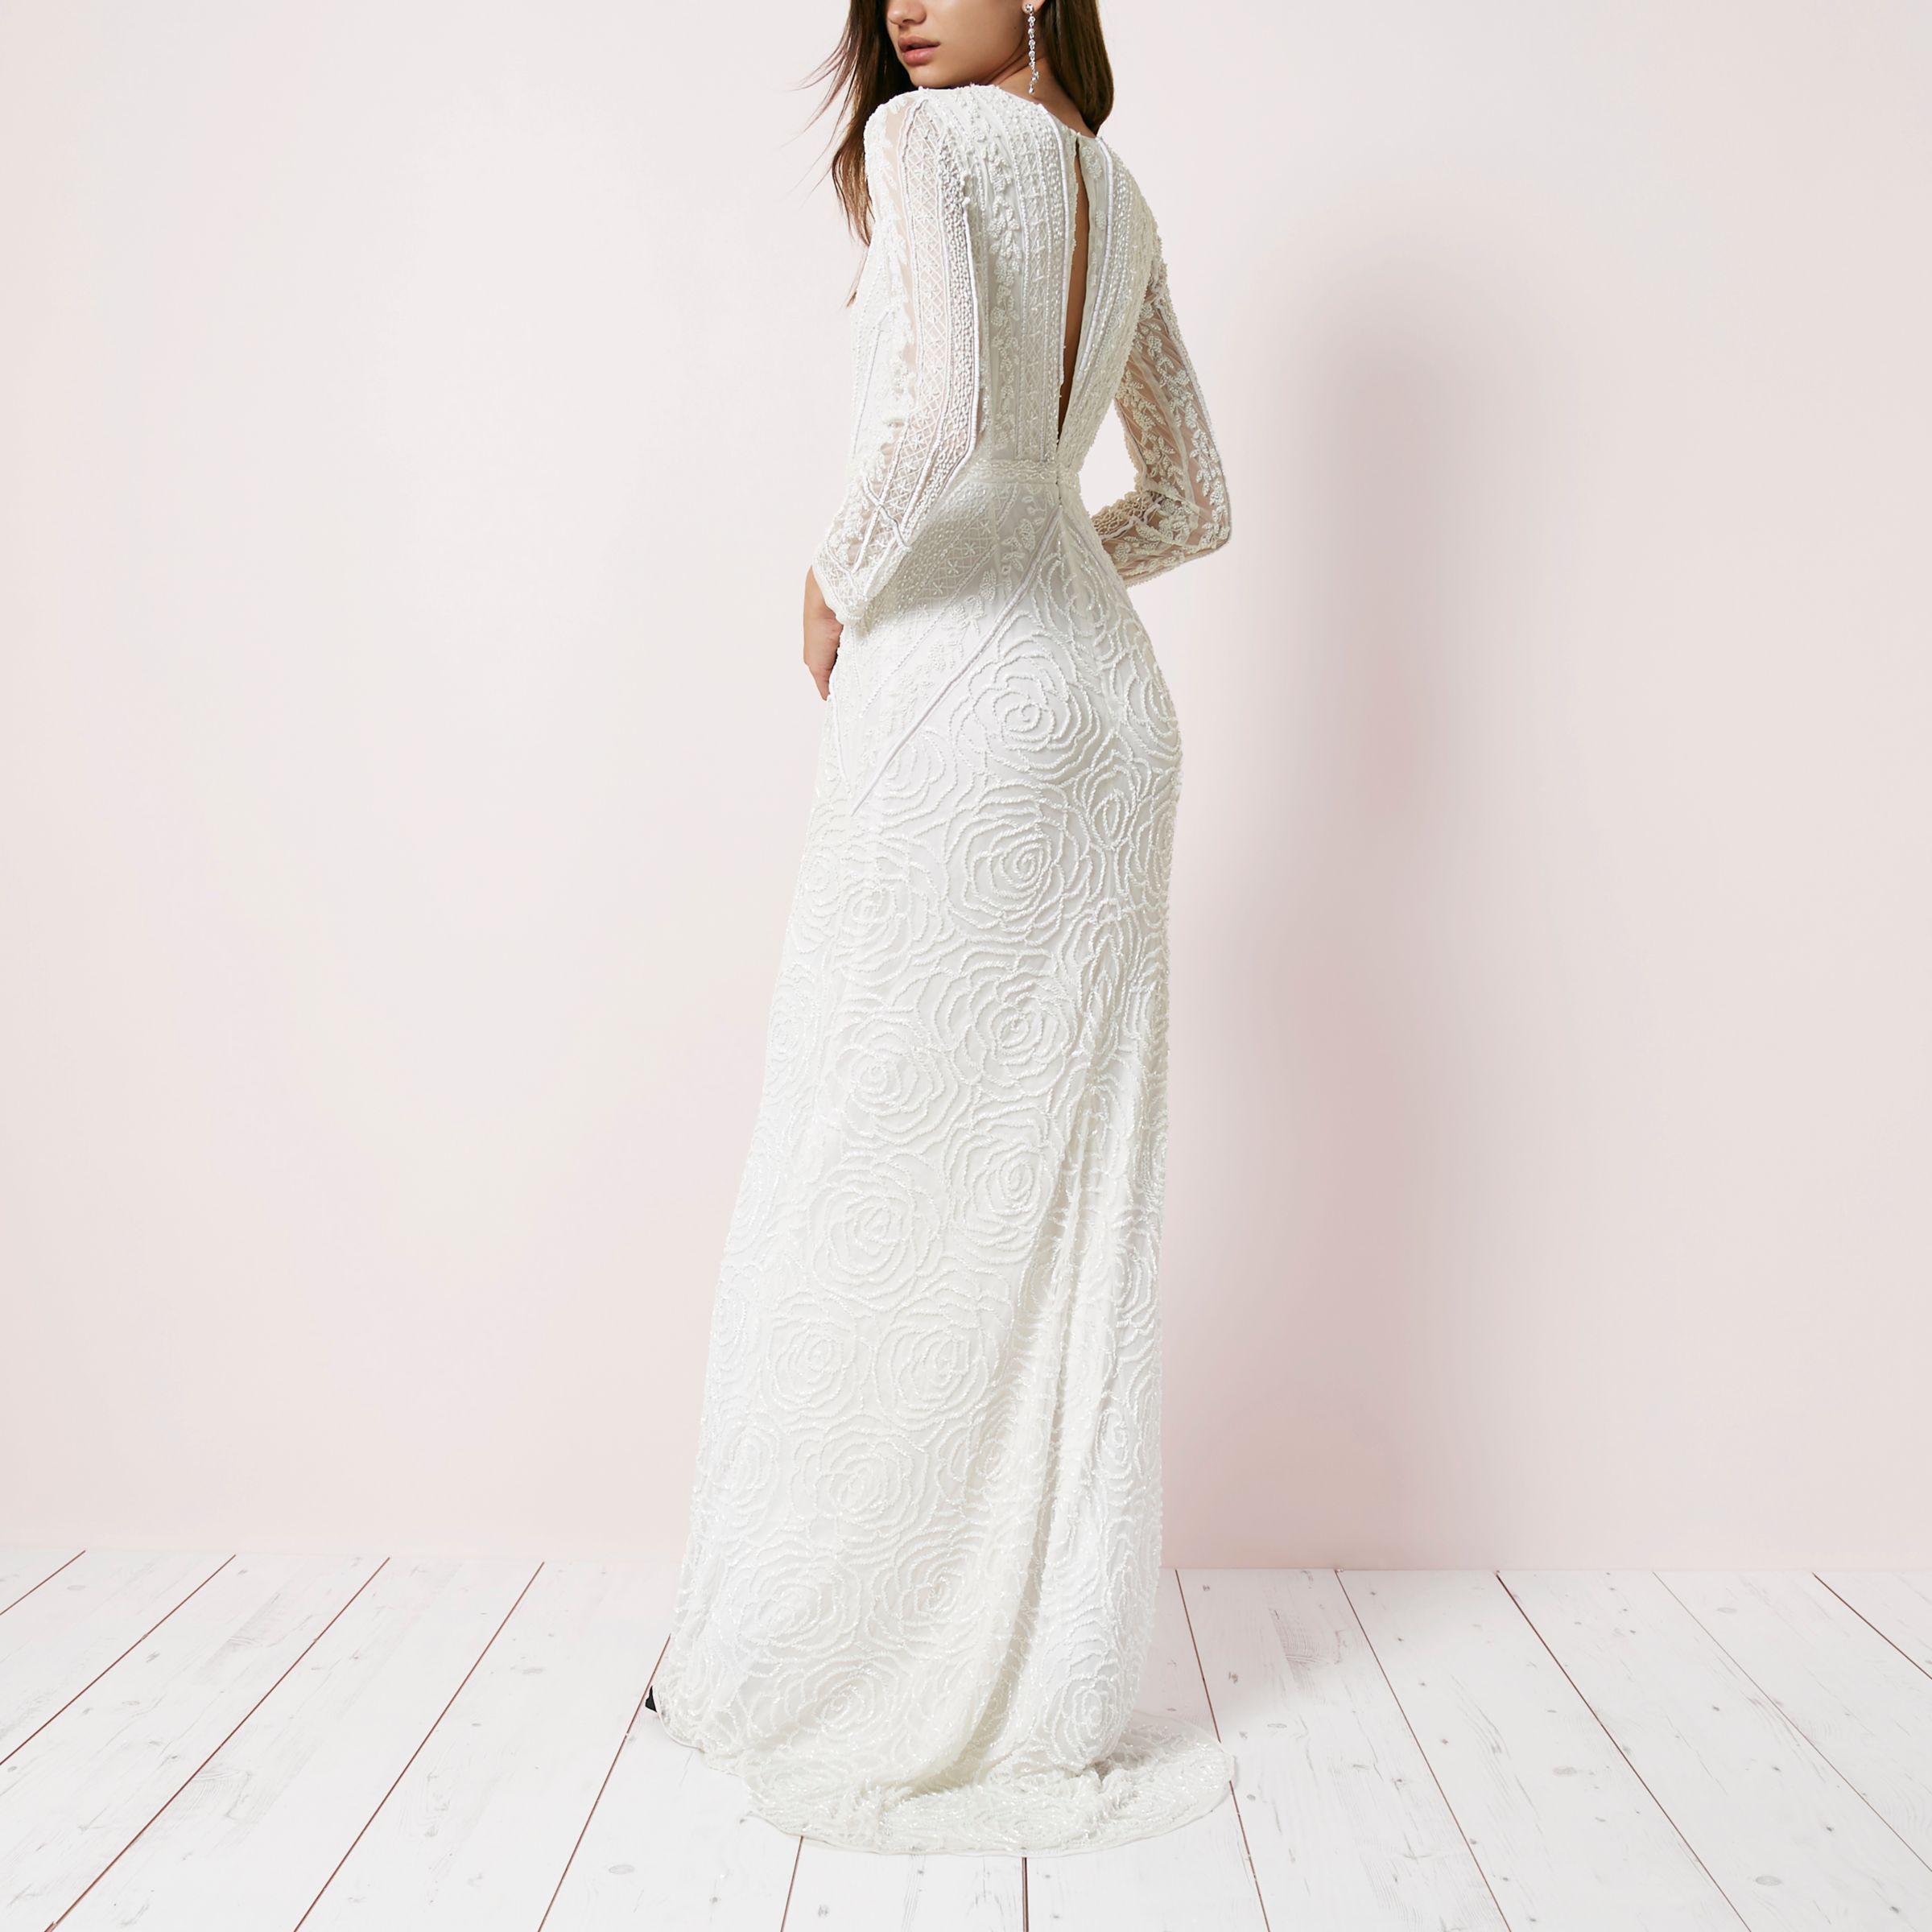 dfc1a84a403a6 River Island Cream Sequin Long Sleeve Maxi Dress in Natural - Lyst